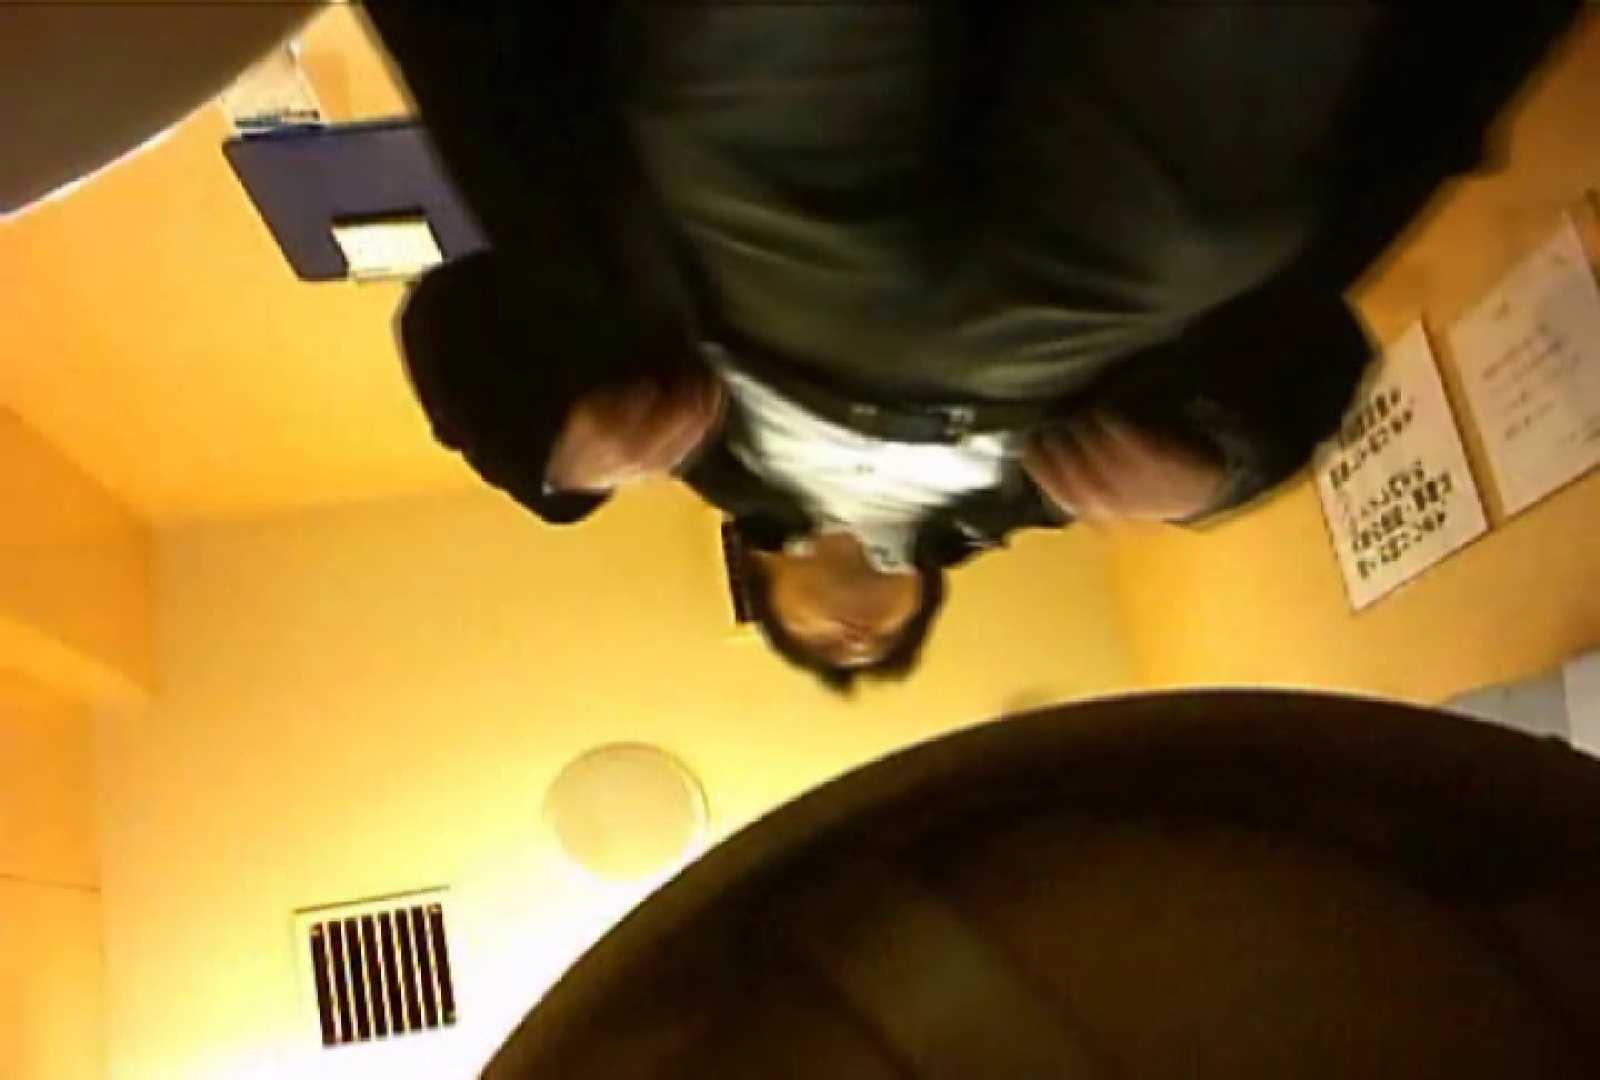 SEASON 2ND!掴み取りさんの洗面所覗き!in新幹線!VOL.02 スーツボーイズ | ノンケボーイズ  82pic 69